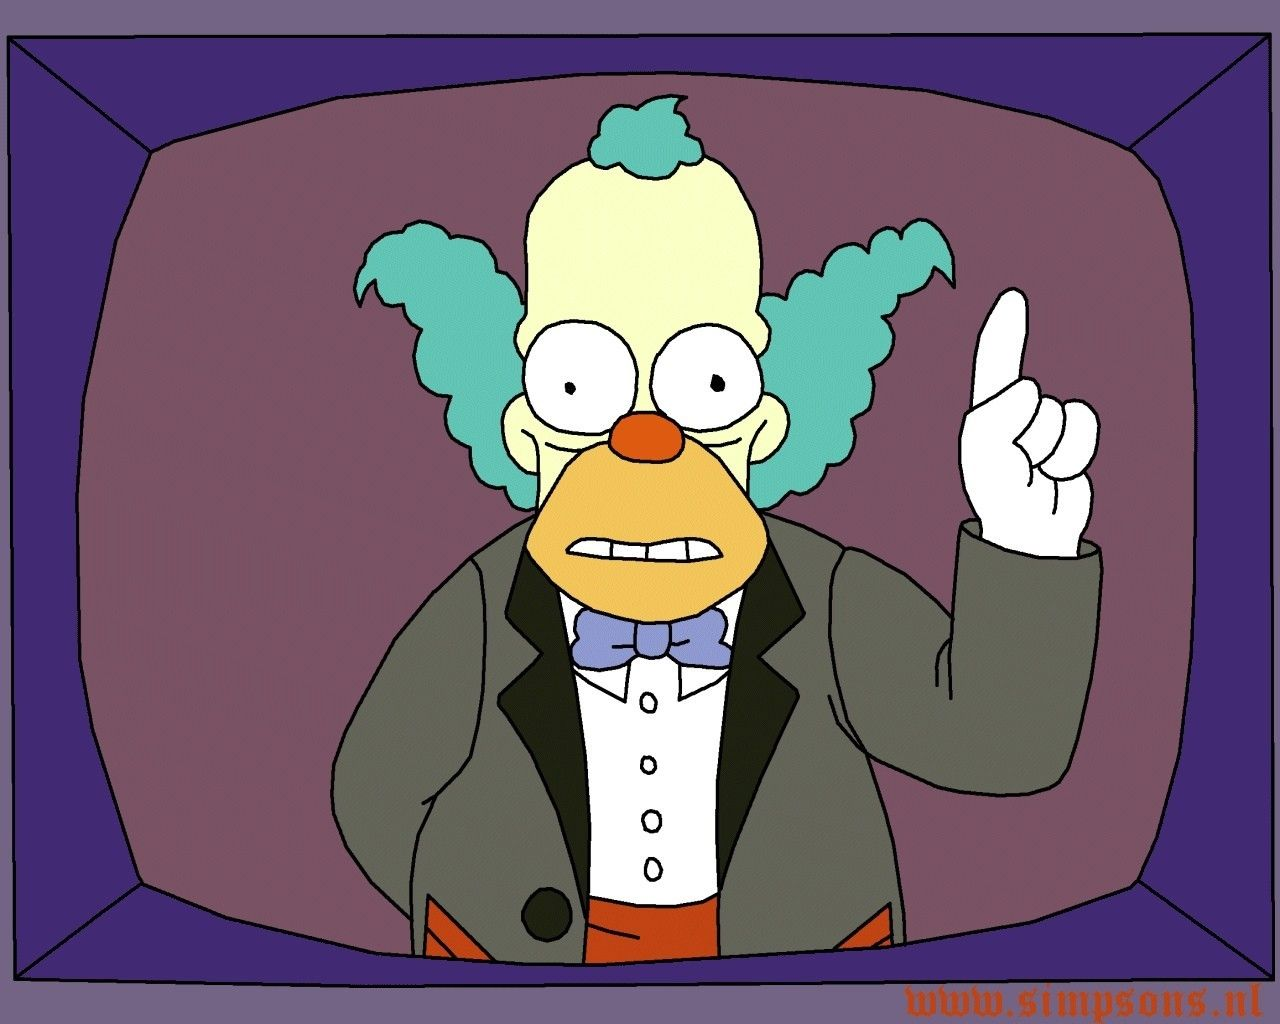 Krusty the clown simpsons wallpapers pinterest - Clown simpson ...